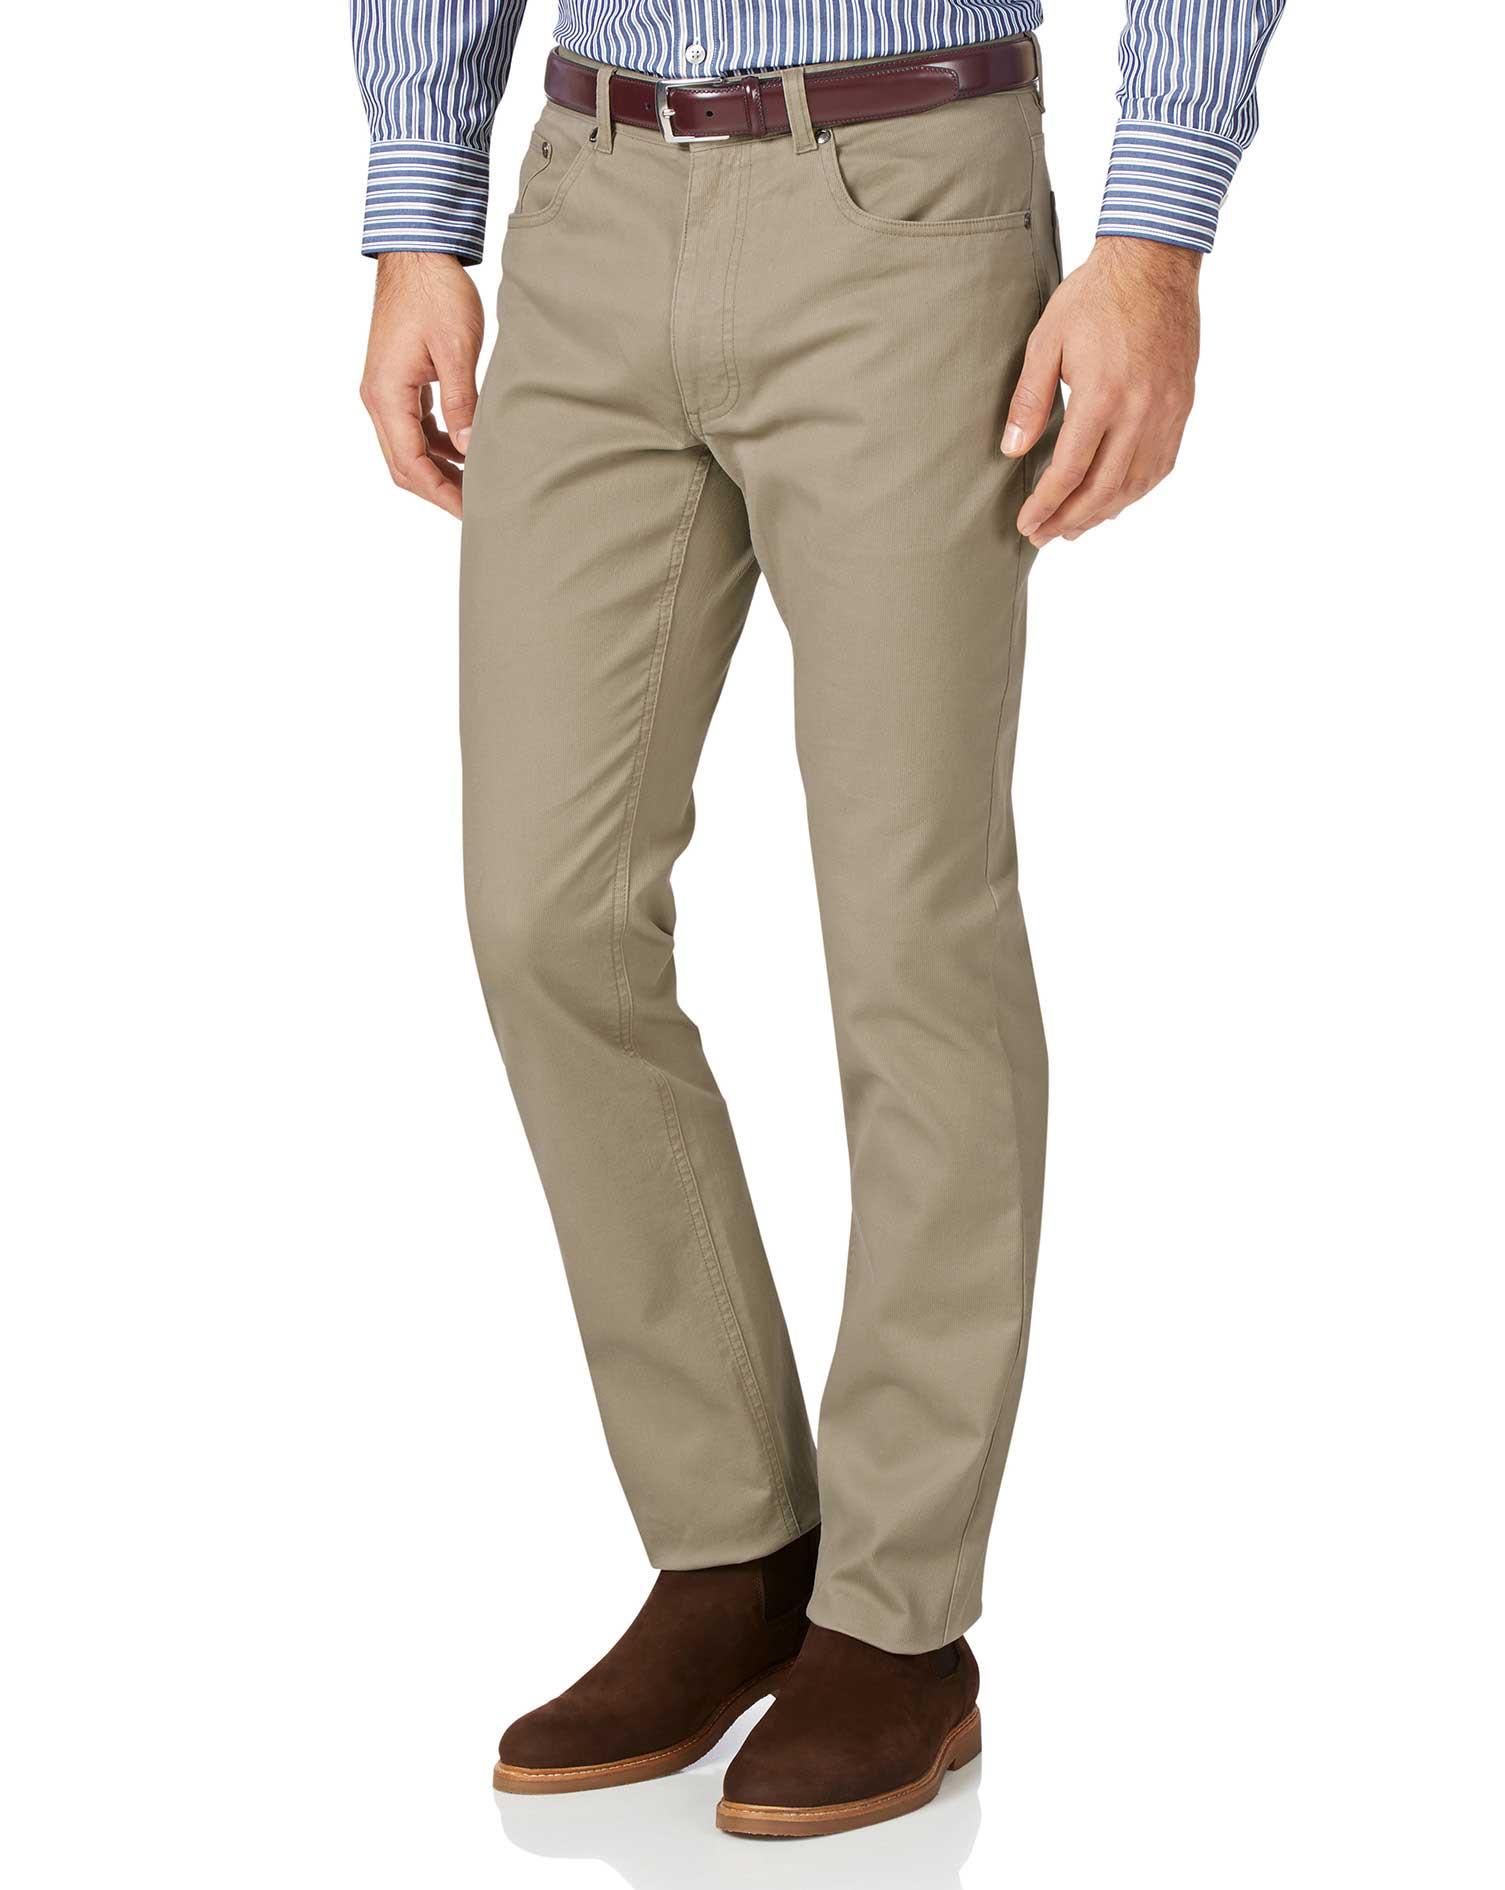 551bad3c8486 Stone slim fit five pocket Bedford corduroy trousers